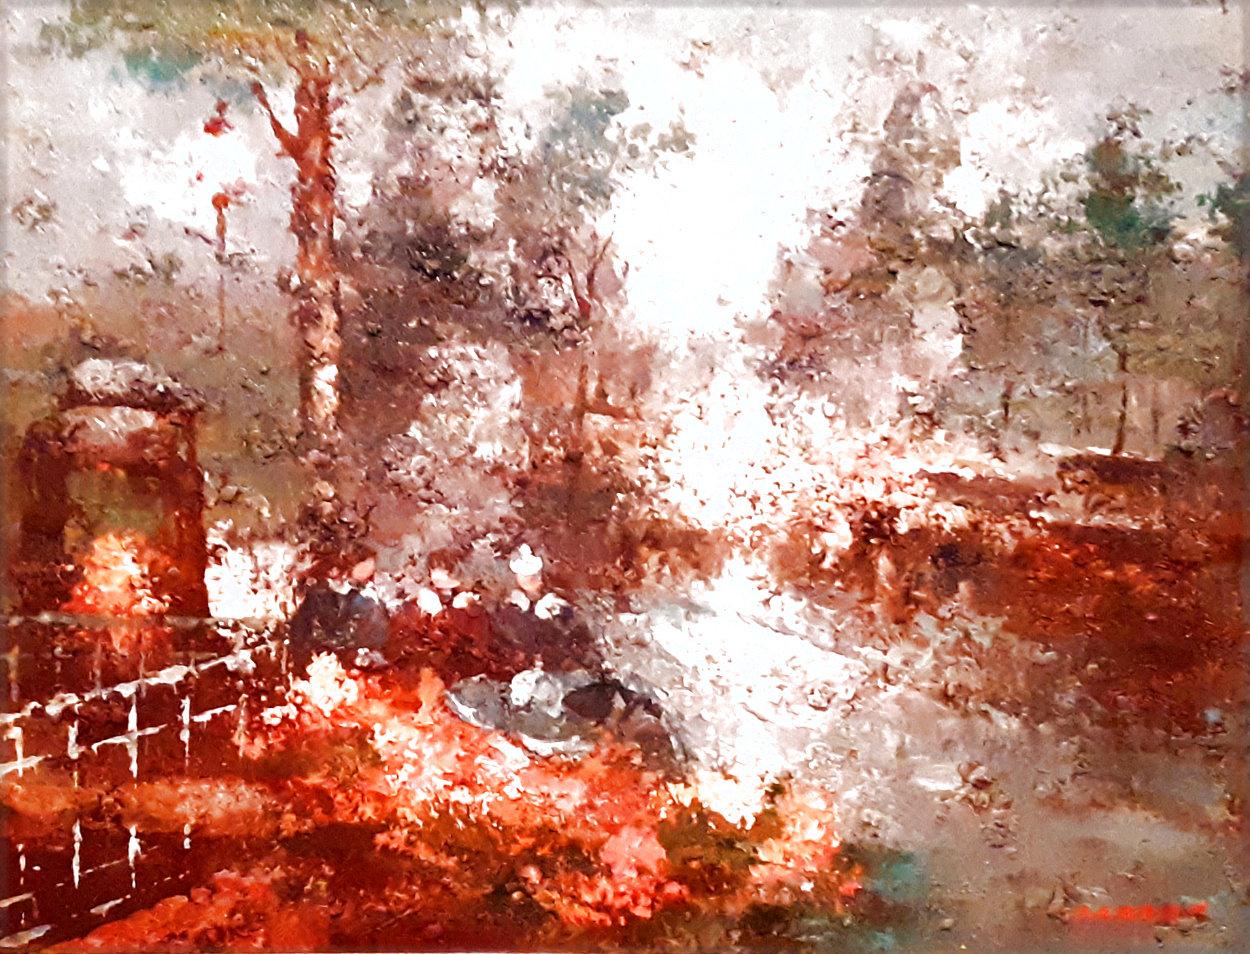 Untitled Painting 30x25 Original Painting by Edward Barton